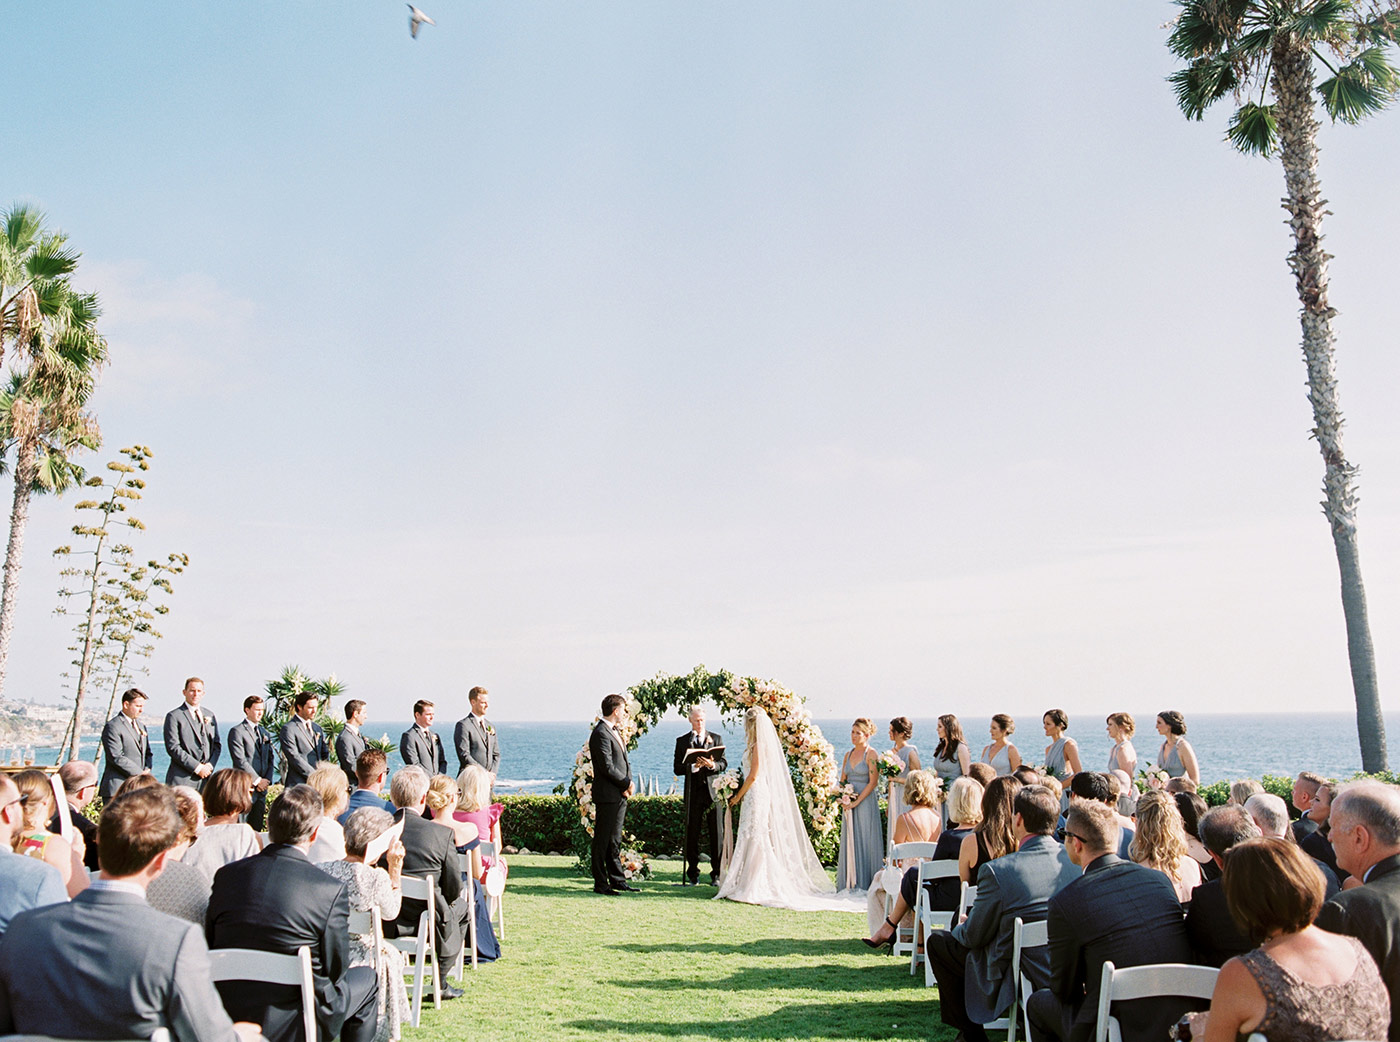 mykaela and brendon wedding ceremony on lawn facing ocean